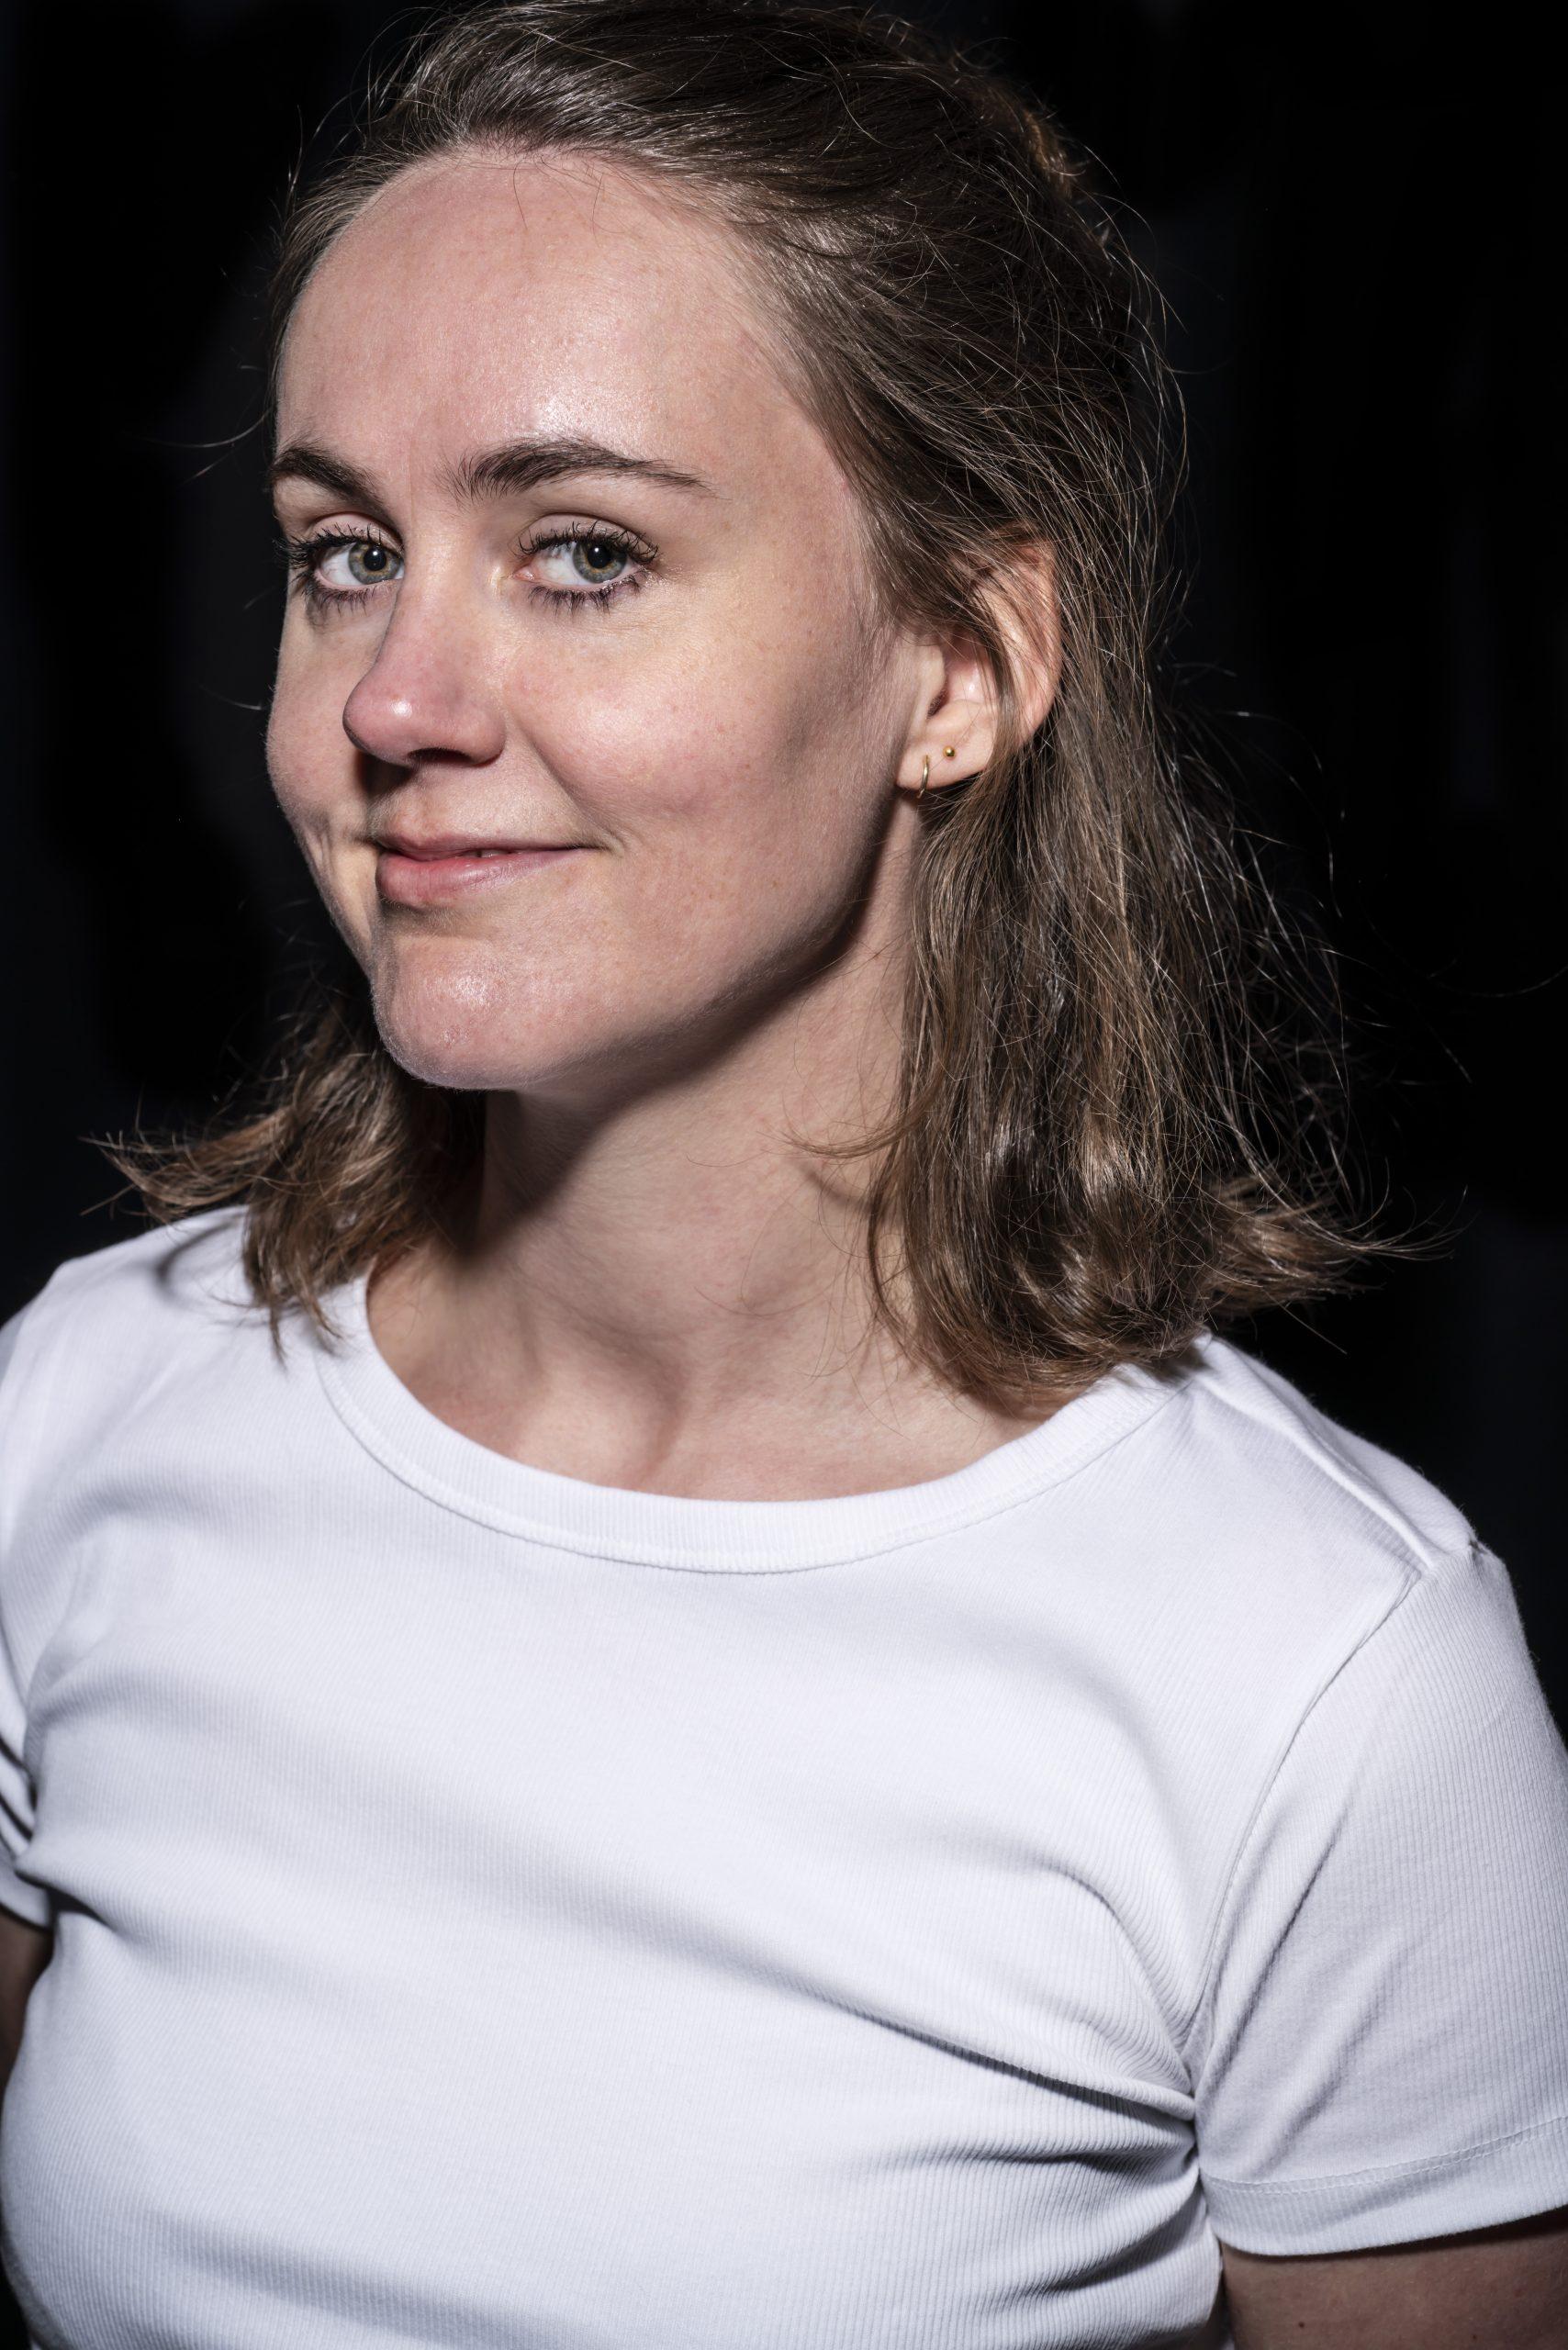 Simone Eggen